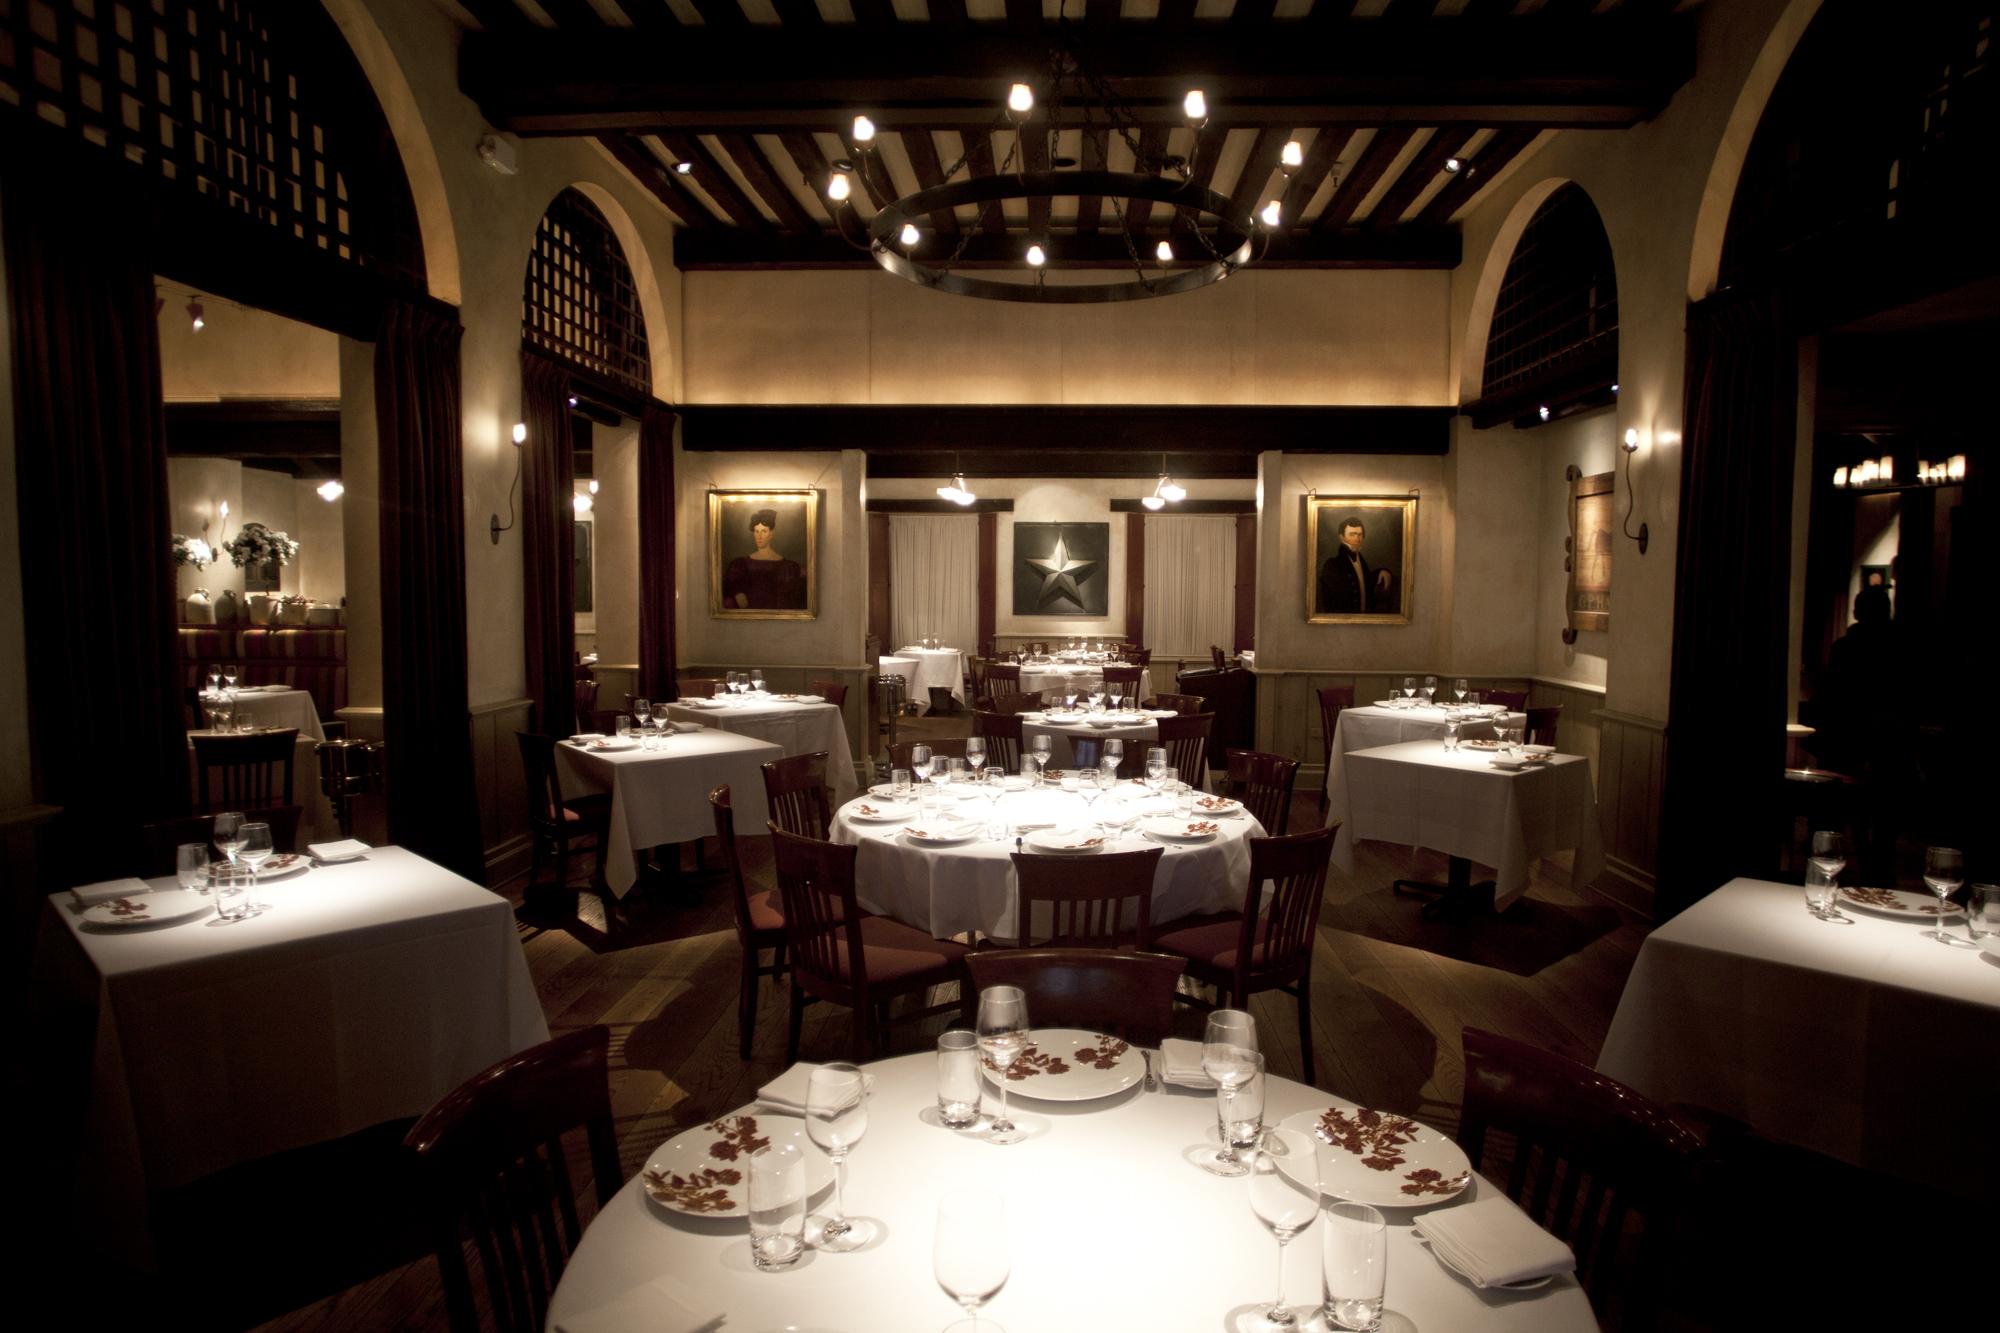 Gramercy Tavern Under Fire for Alleged Gender Discrimination in New Lawsuit